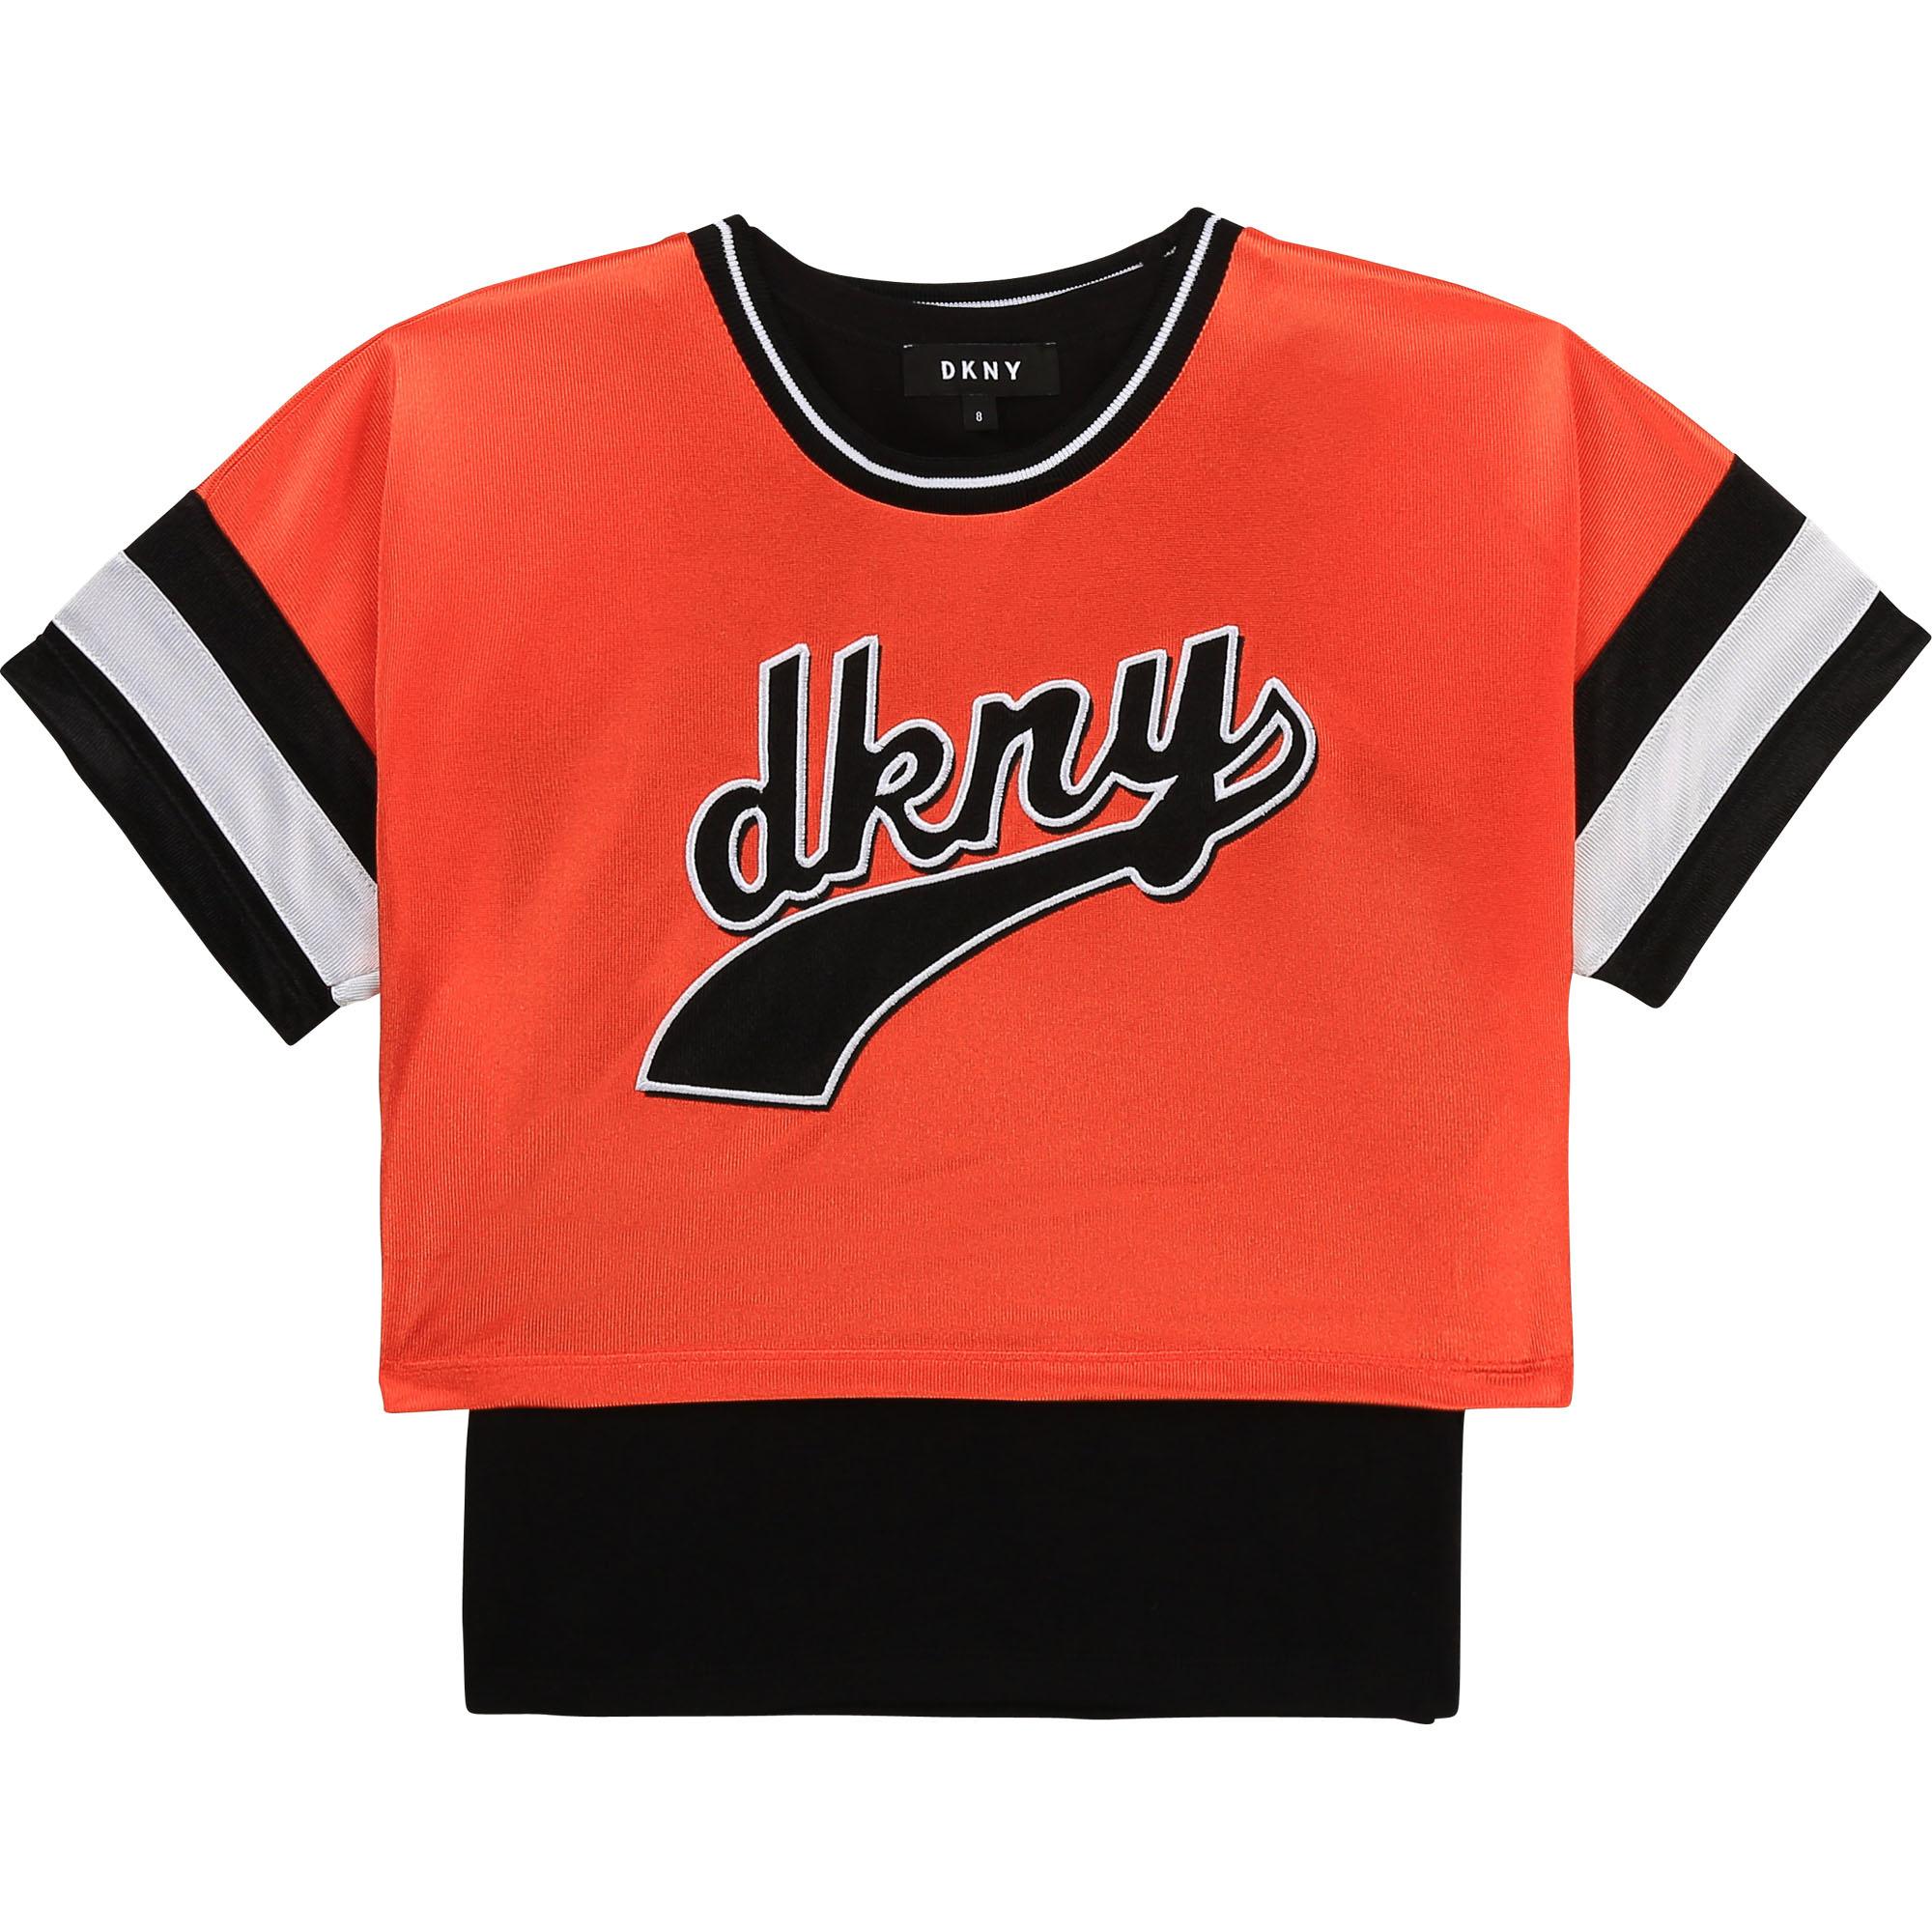 DKNY t-shirt + top jersey brillant-1